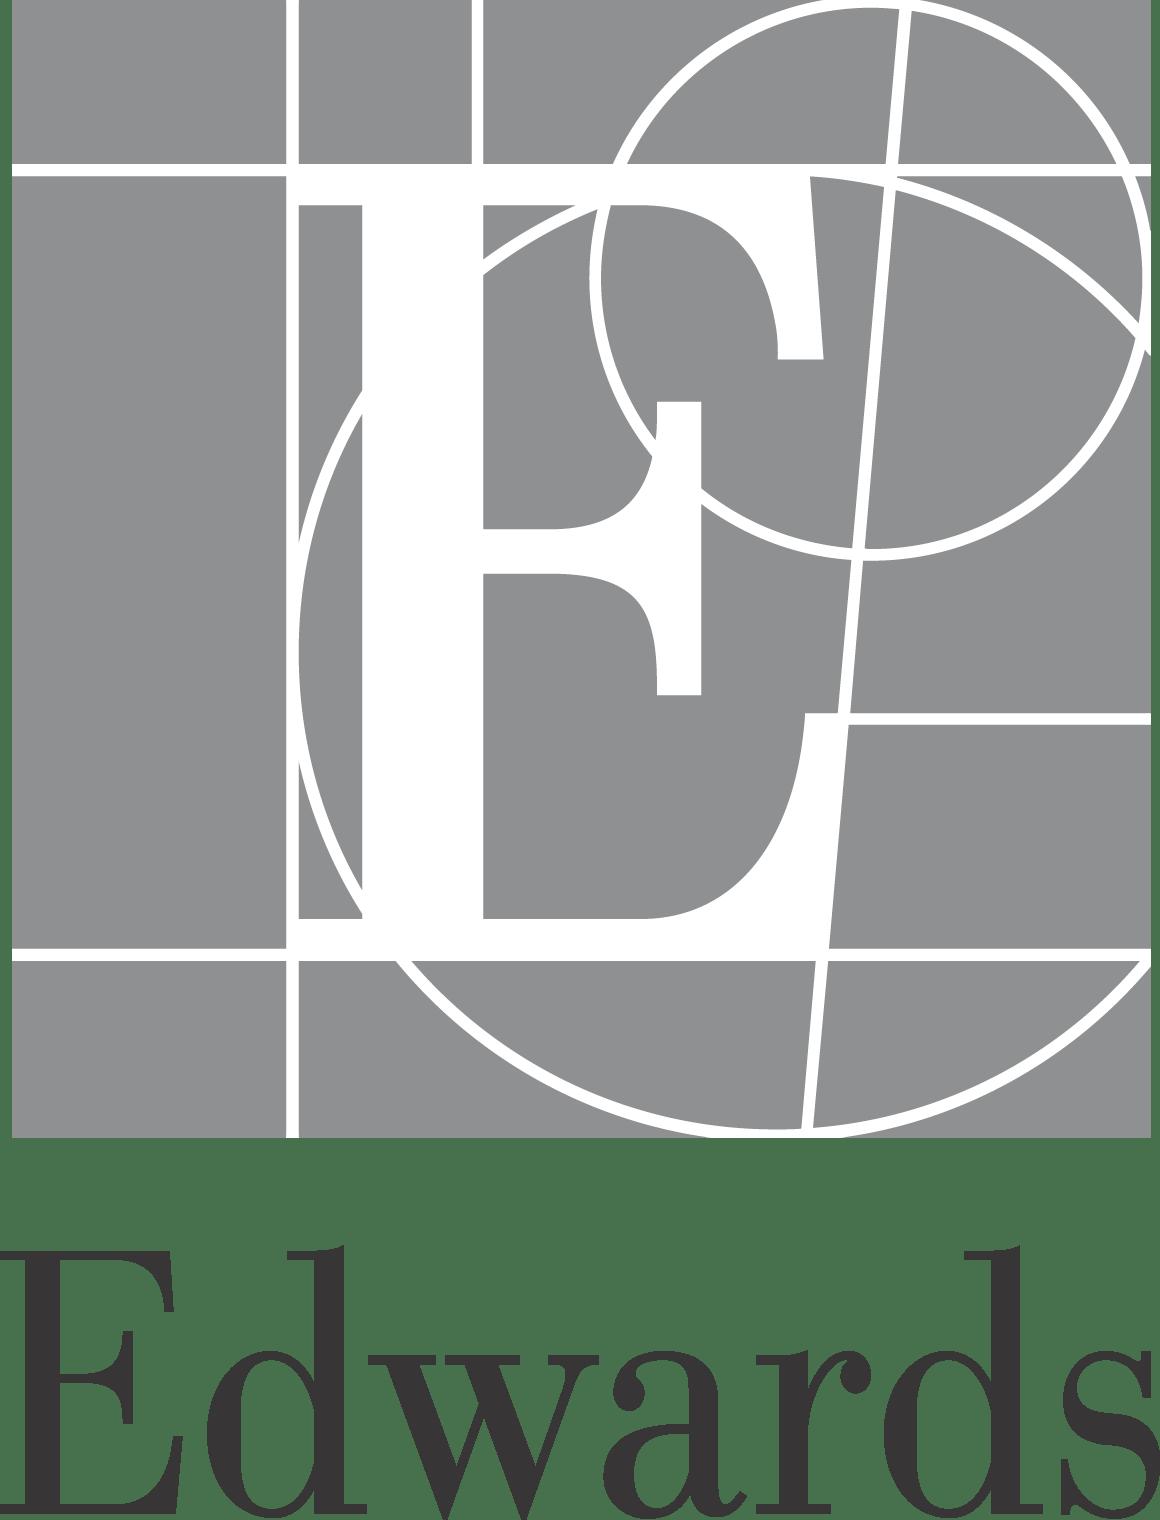 Edwards Lifesciences Logo png